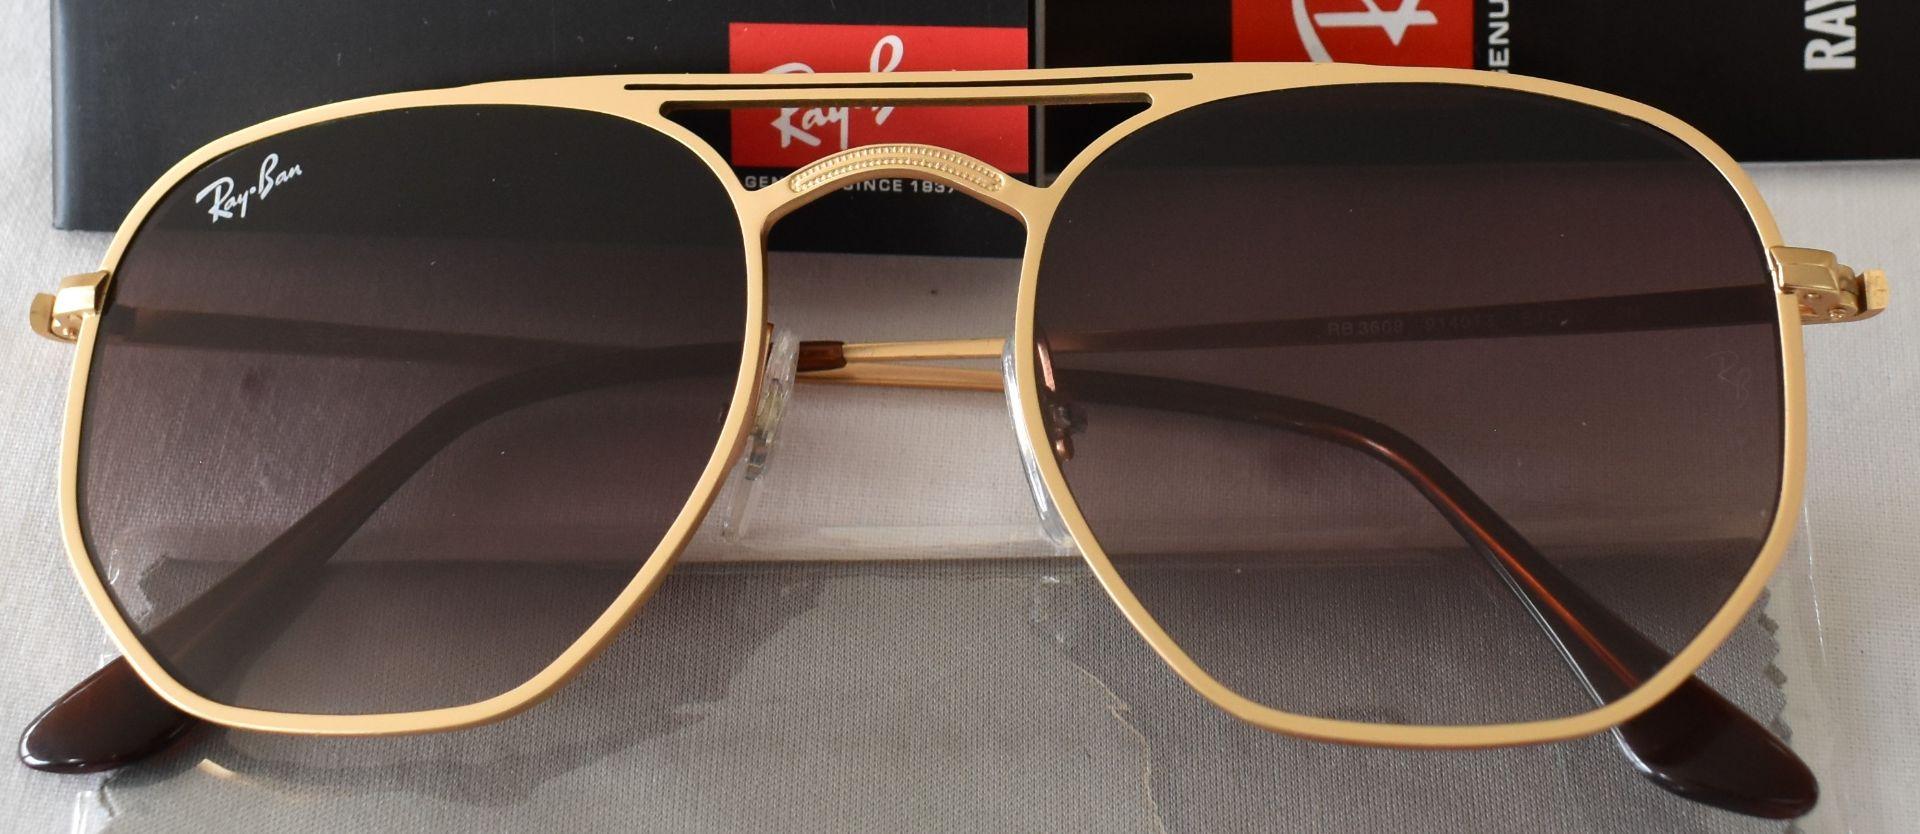 Ray Ban Sunglasses ORB3609 914013 *2N - Image 2 of 3